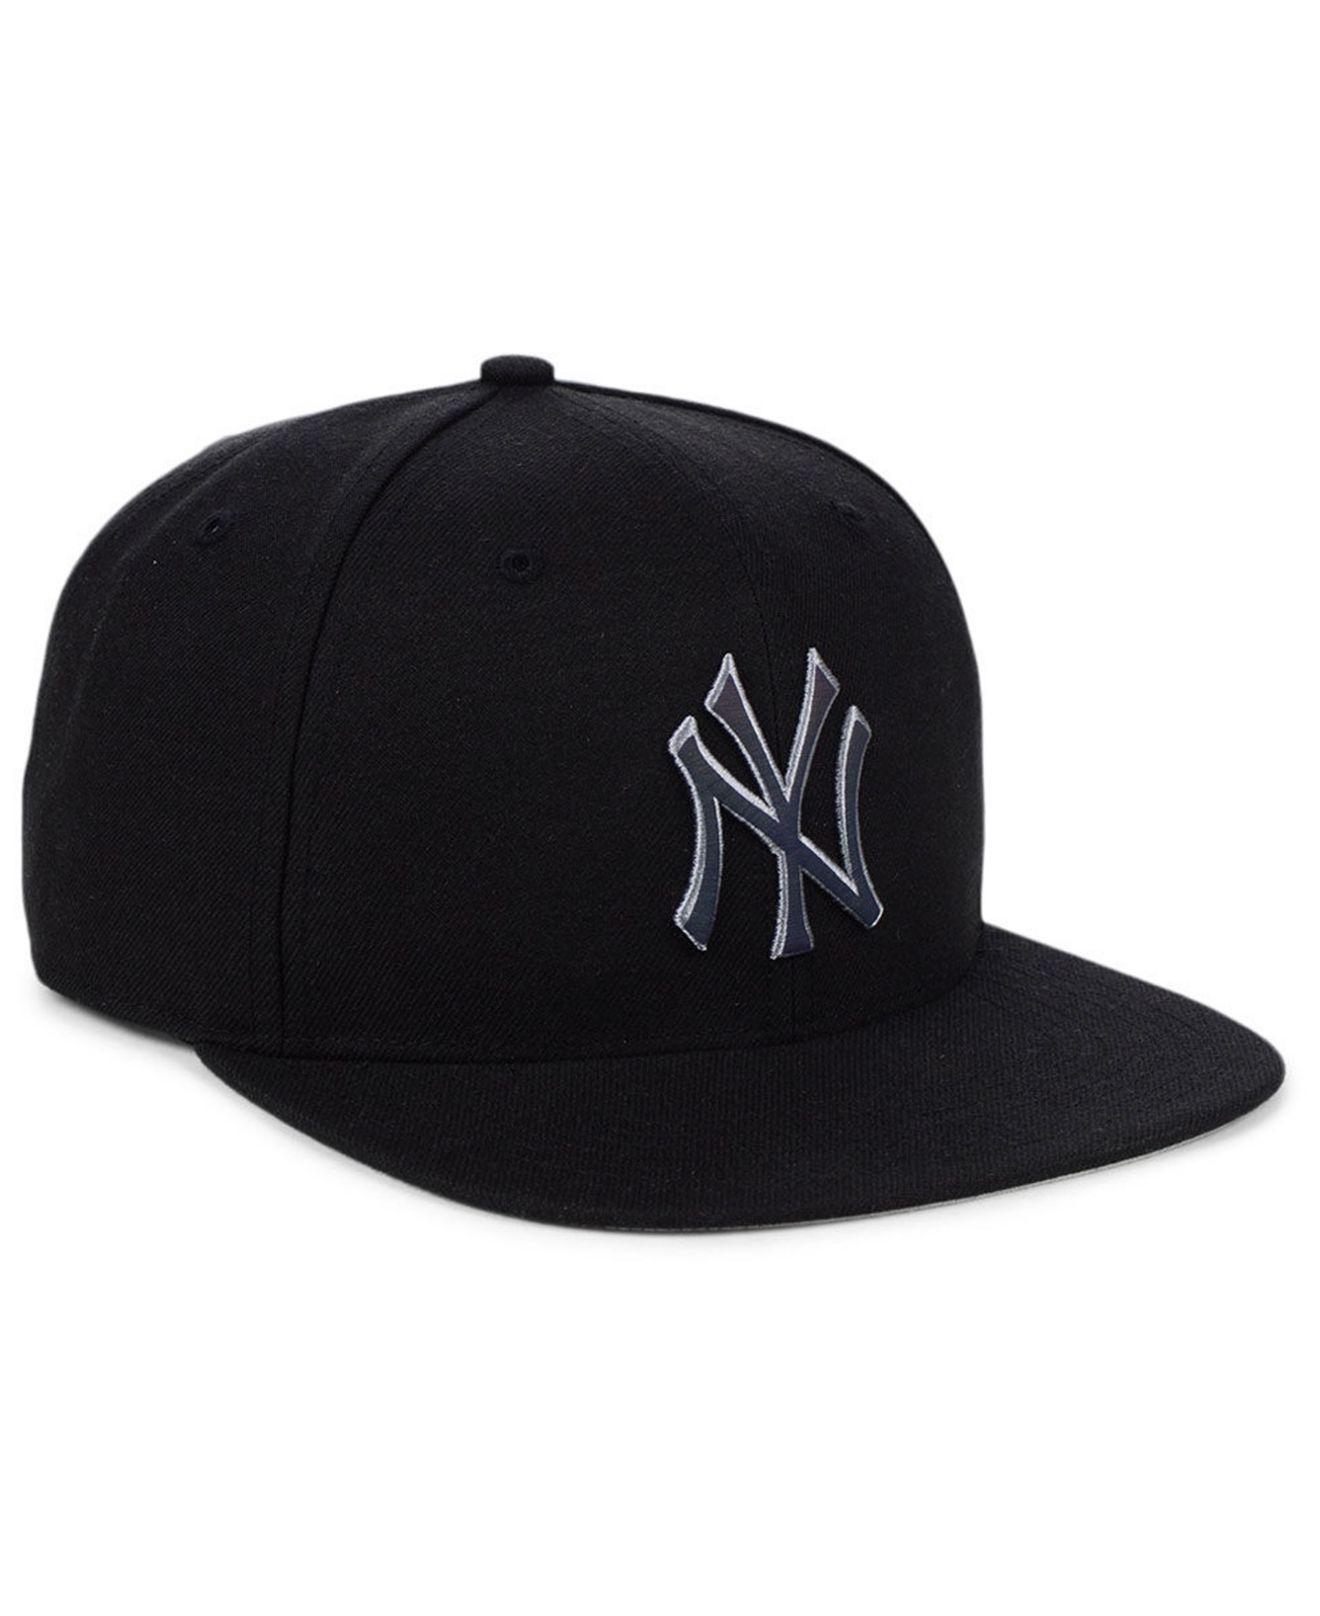 innovative design 3a902 4c2d5 47 Brand New York Yankees Iridescent Snapback Cap in Black for Men - Lyst